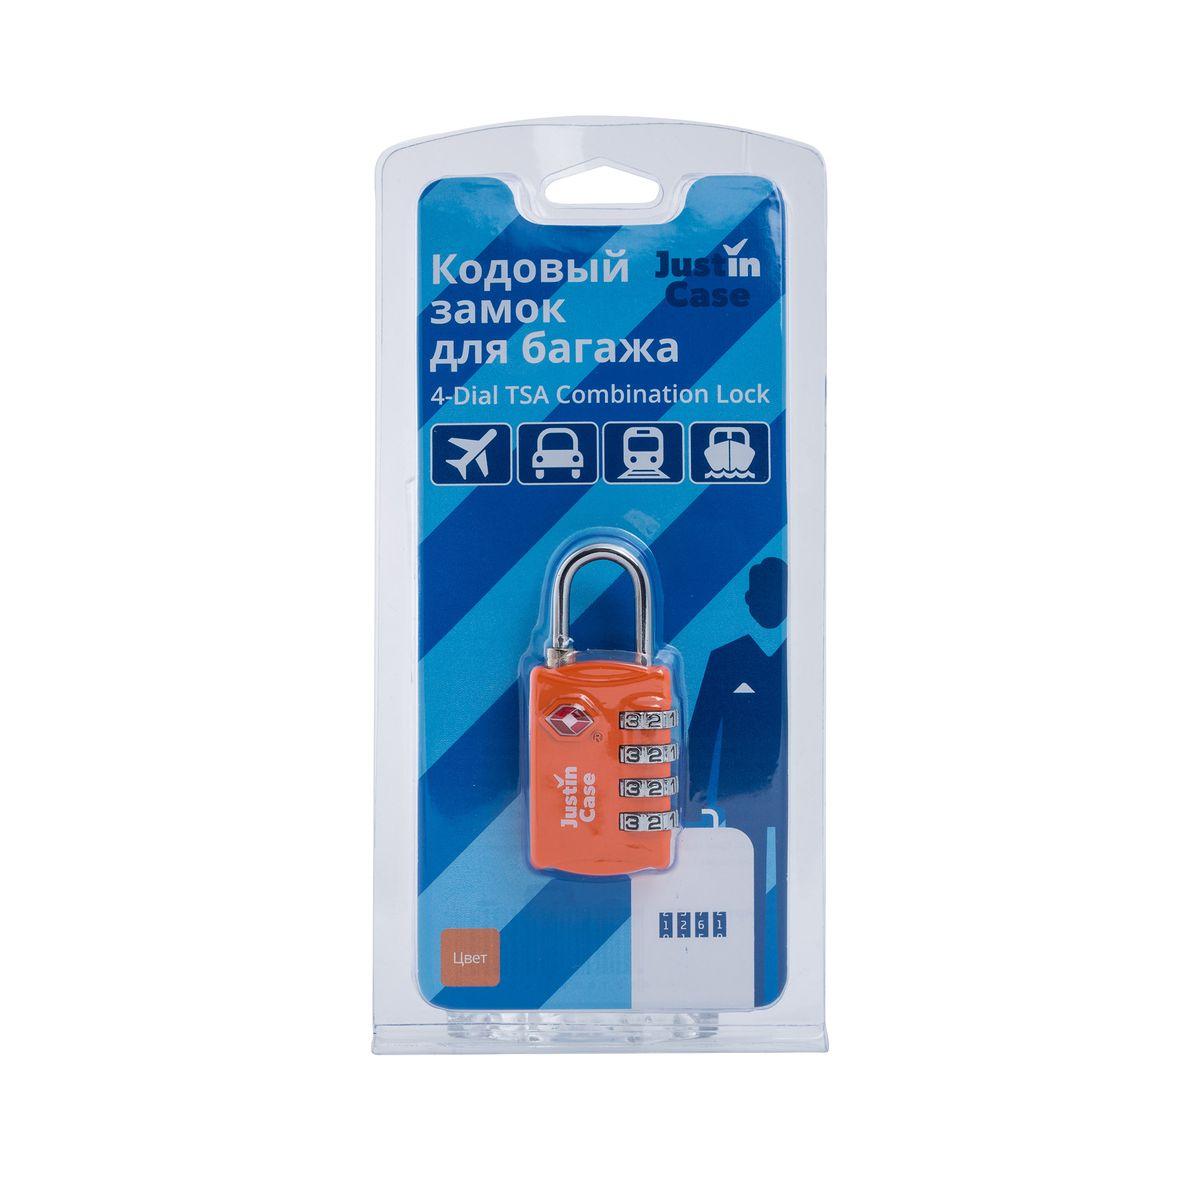 "Замок кодовый для багажа JustinCase ""4-Dial TSA Combination Lock"", цвет: оранжевый"